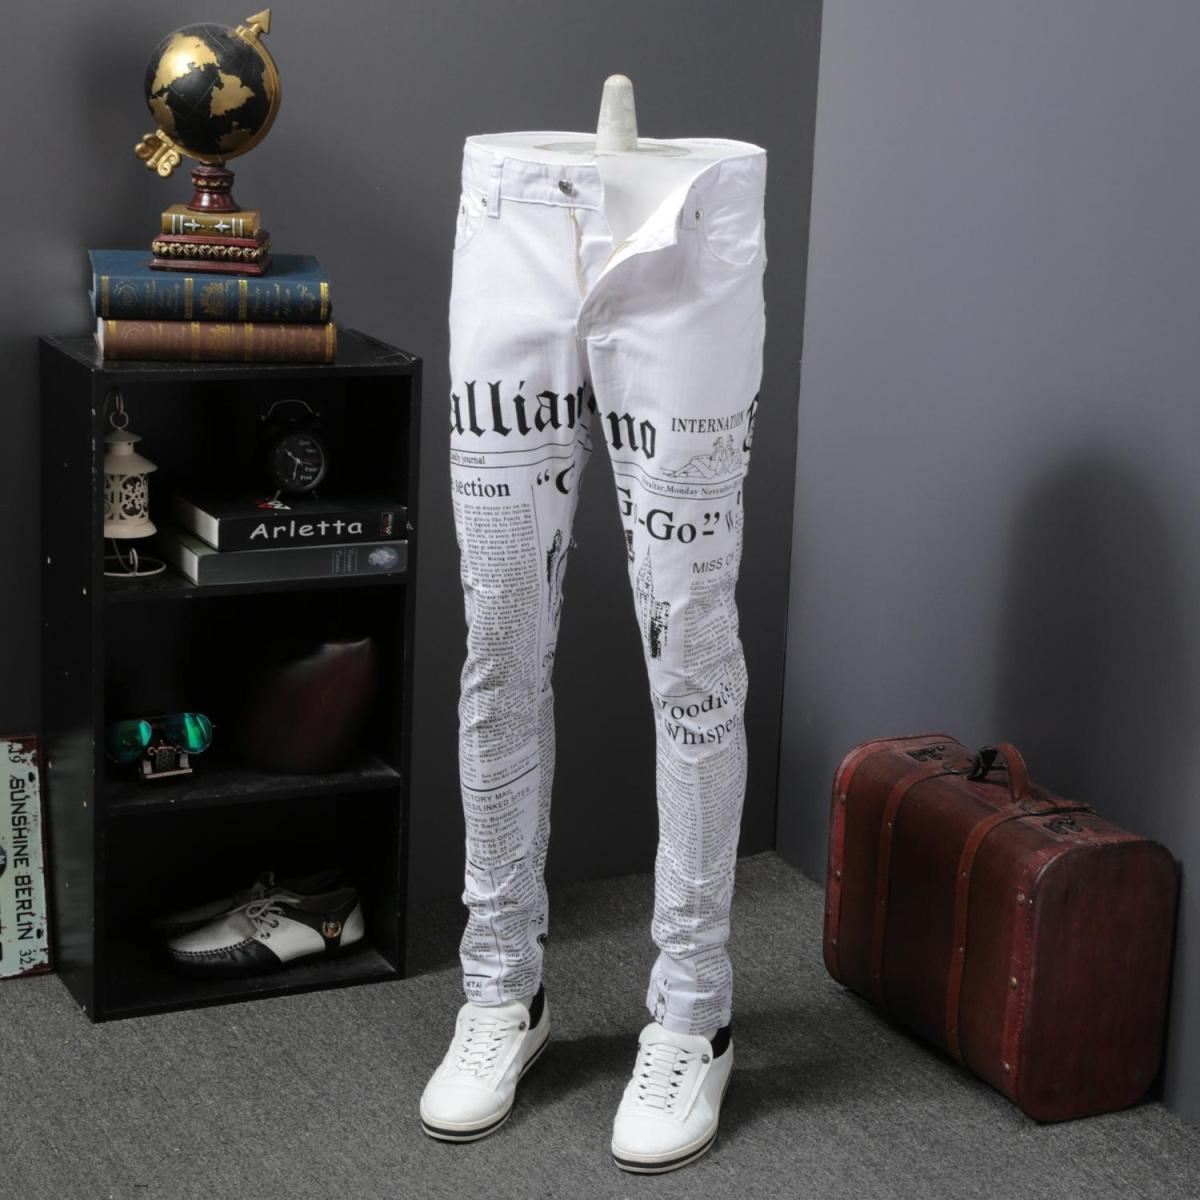 Fashion 2019 Korean Jeans Men Newspaper Print Jeans For Men Slim Fit Casual Denim Pants Men Streetwear Trousers Men Clothes